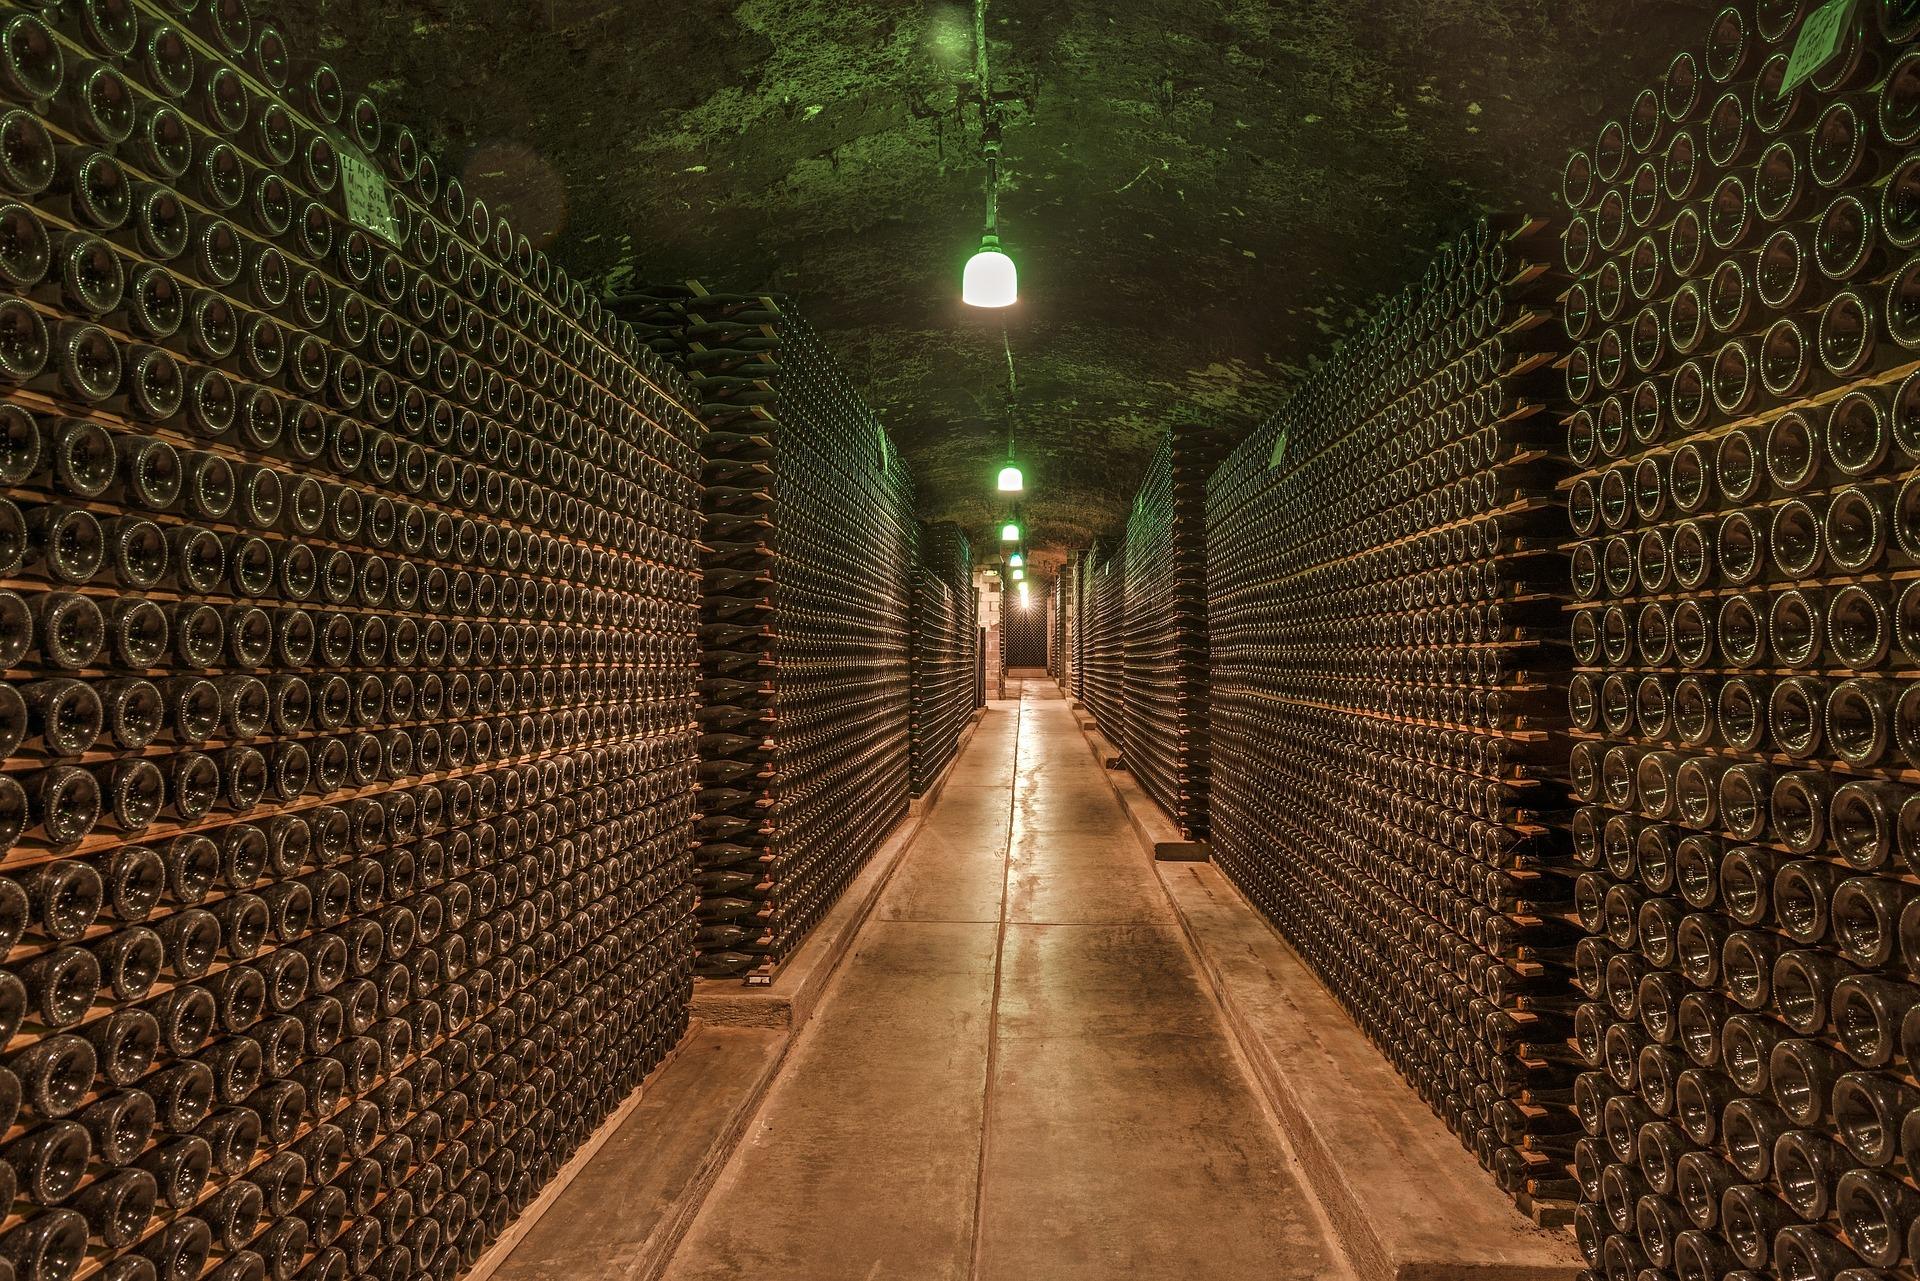 wine-cellar-1329061_1920_1556043063806.jpg